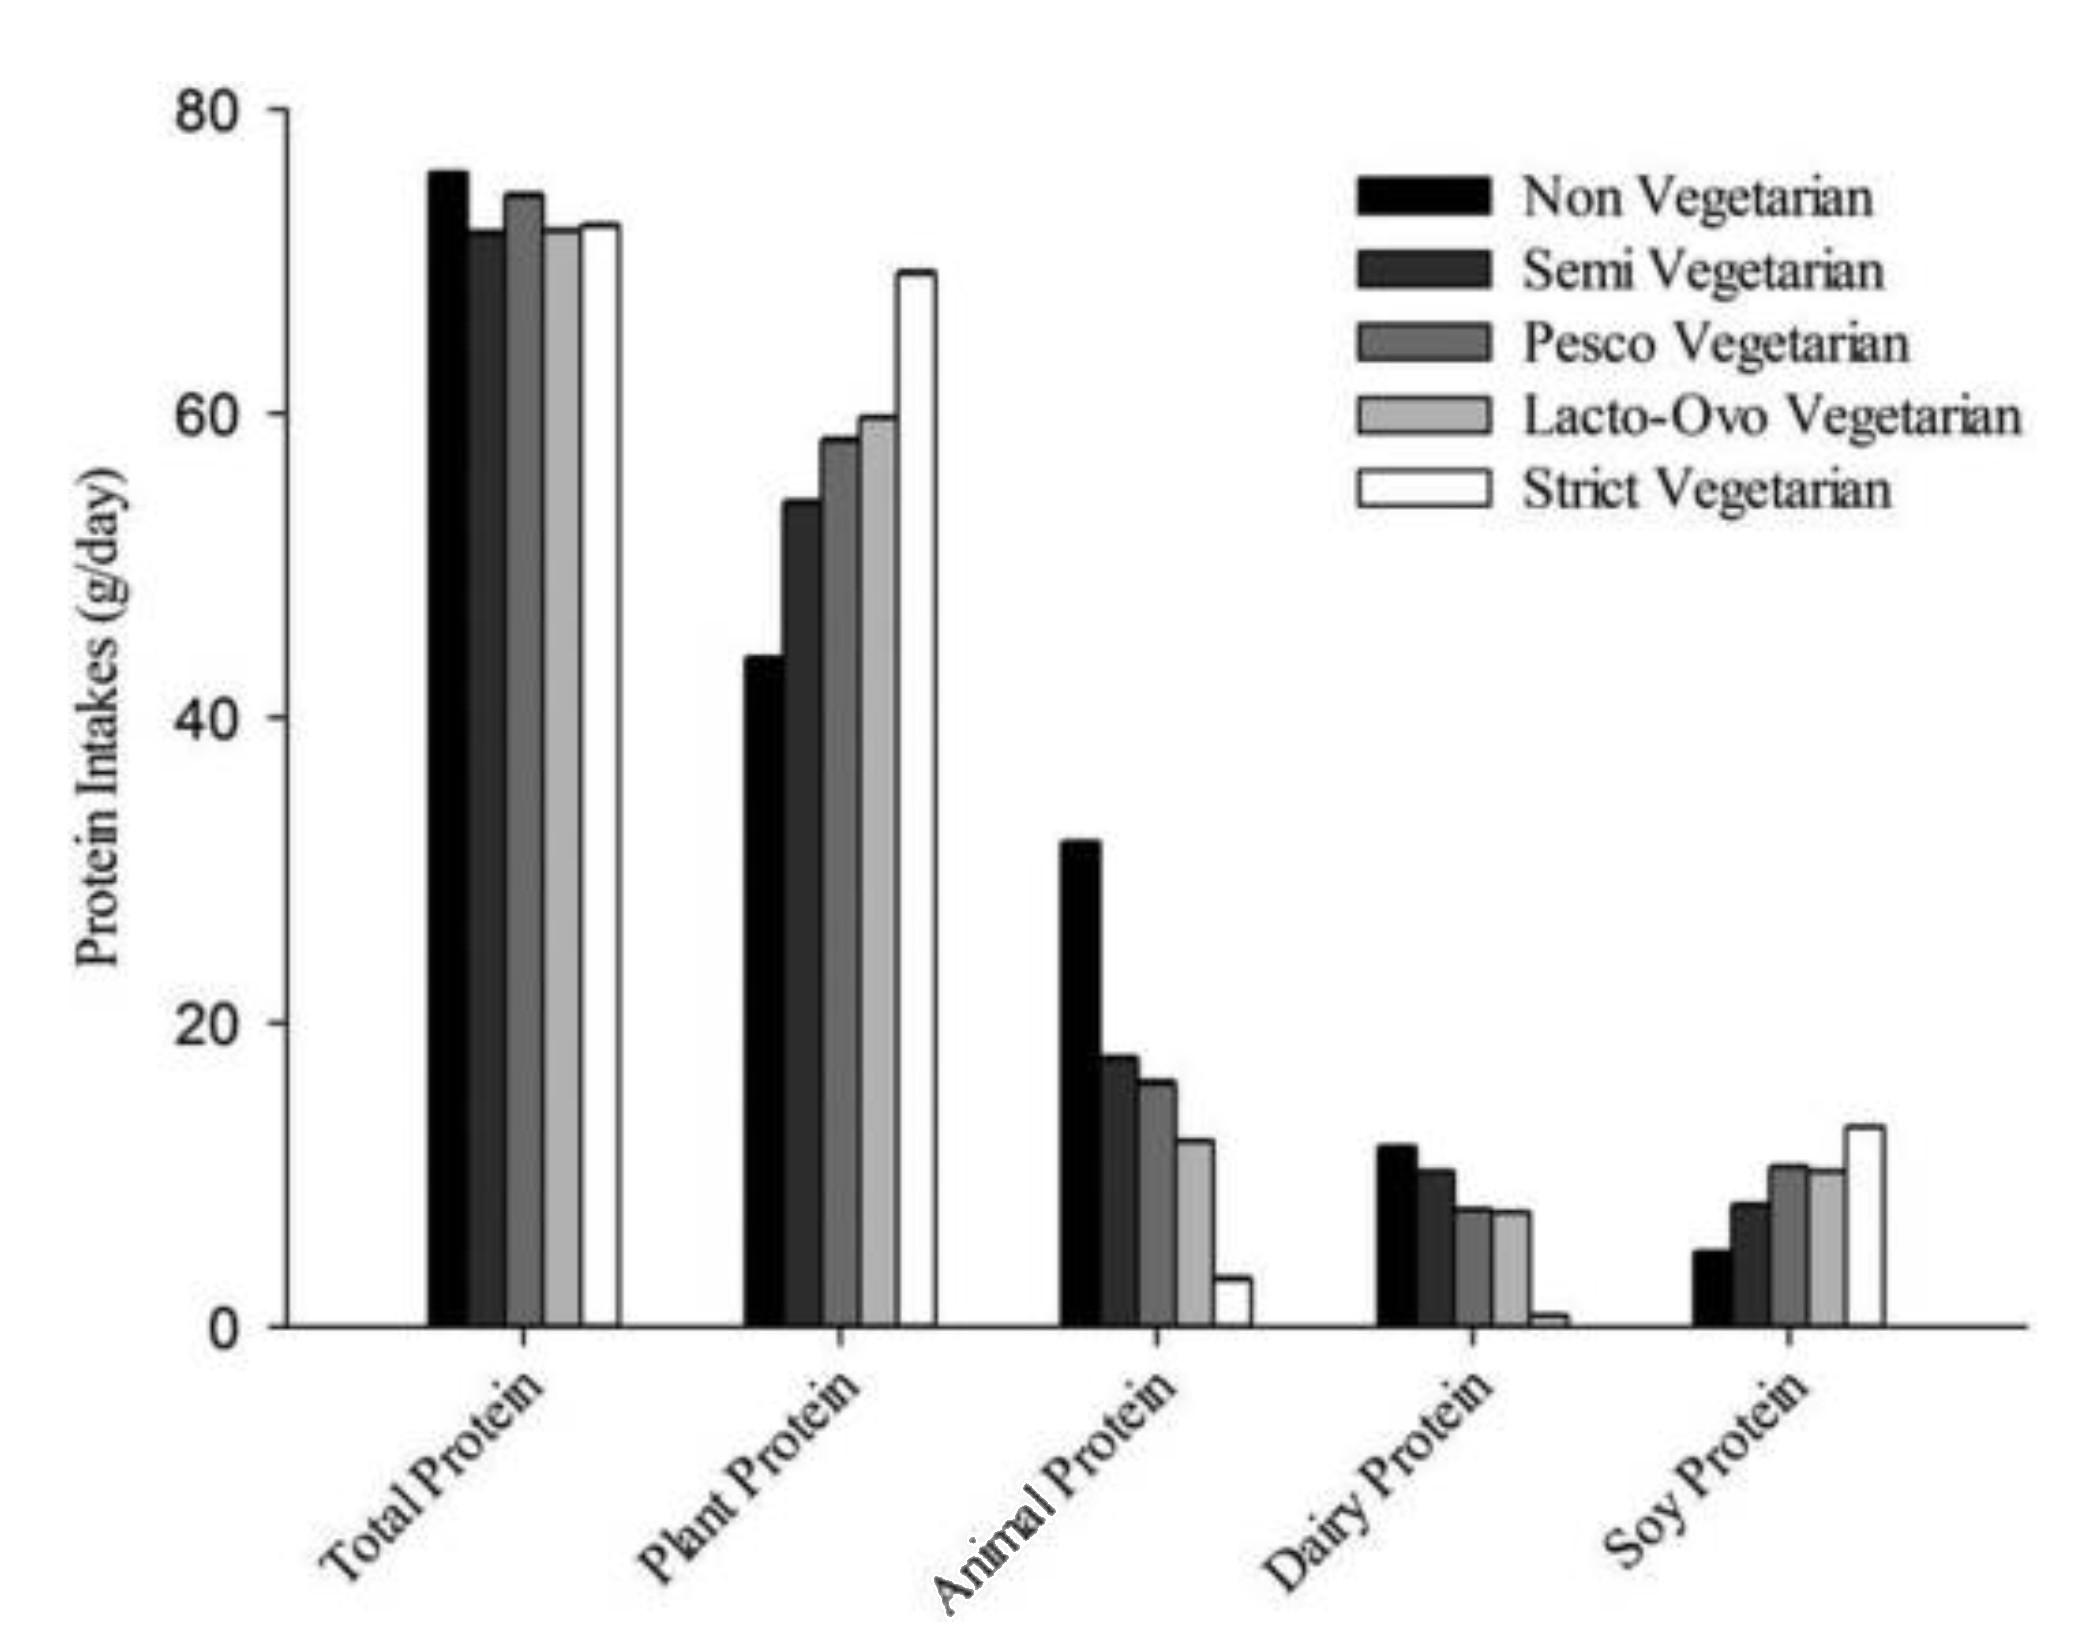 Vegetarian protein consumption